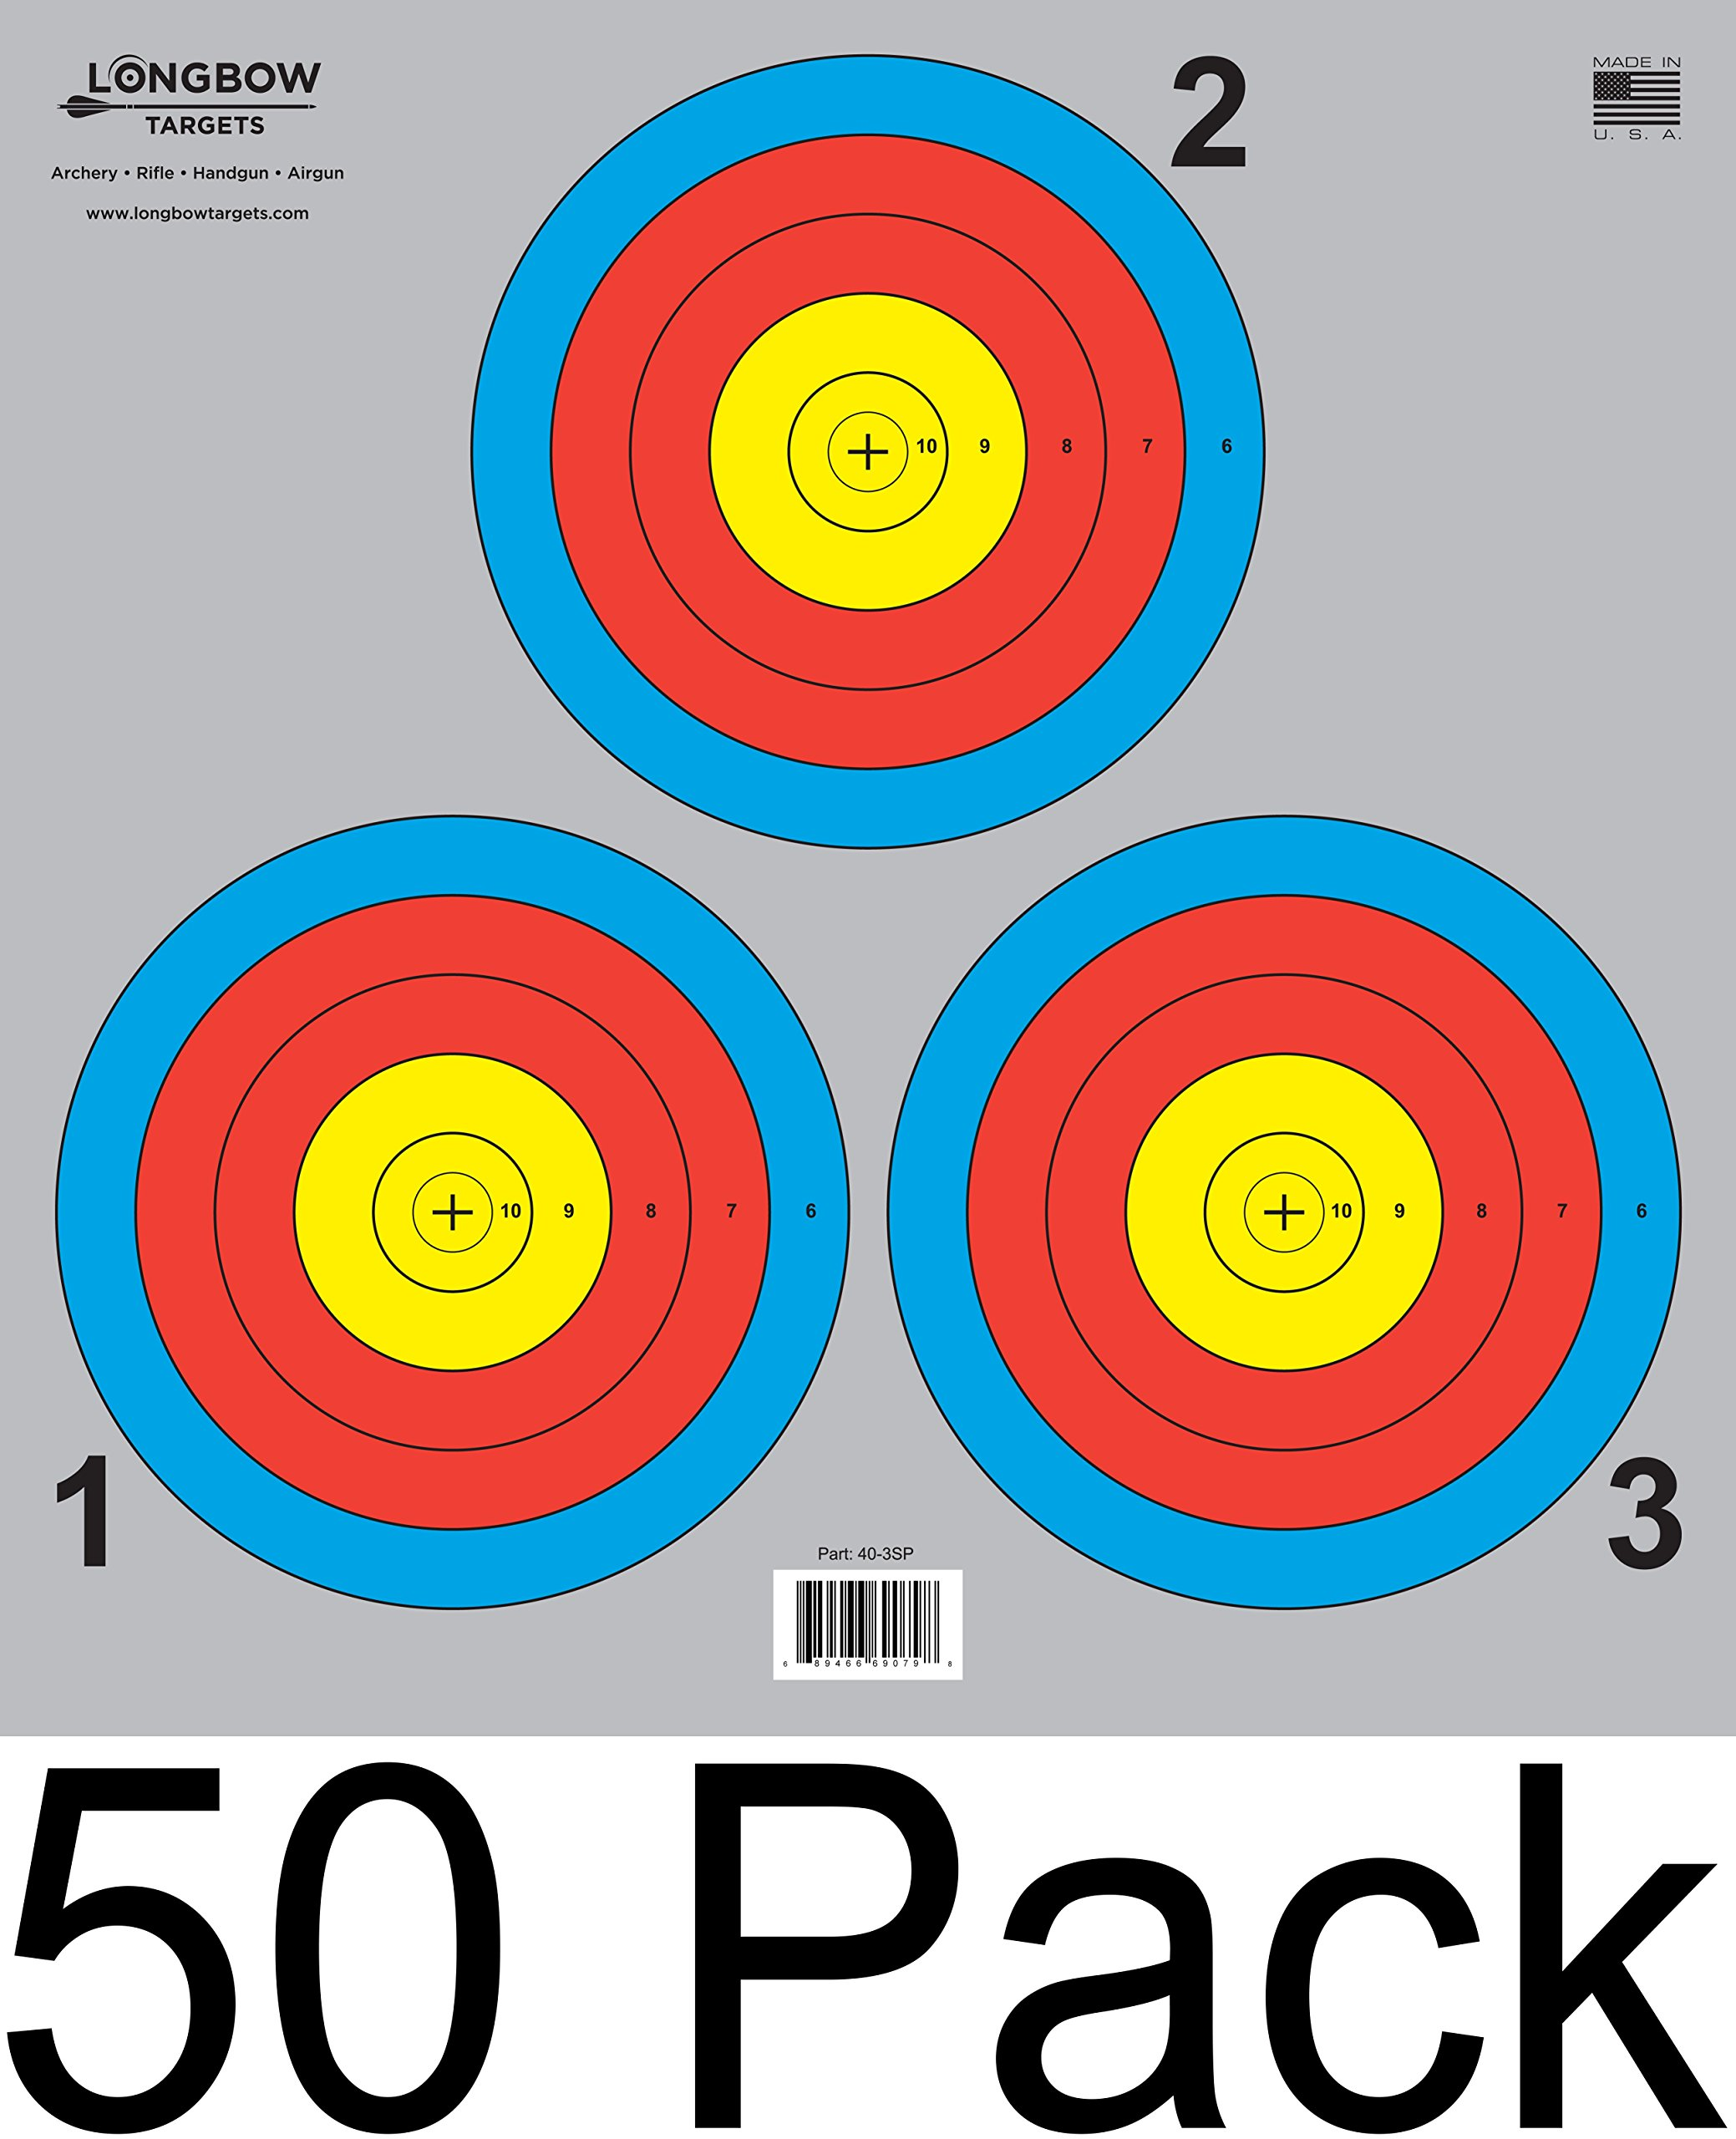 Archery 5 SPOT & 3 SPOT Vegas Targets by Longbow 8, 20, 50 & 200 Packs (3 Spot (50 Pack))